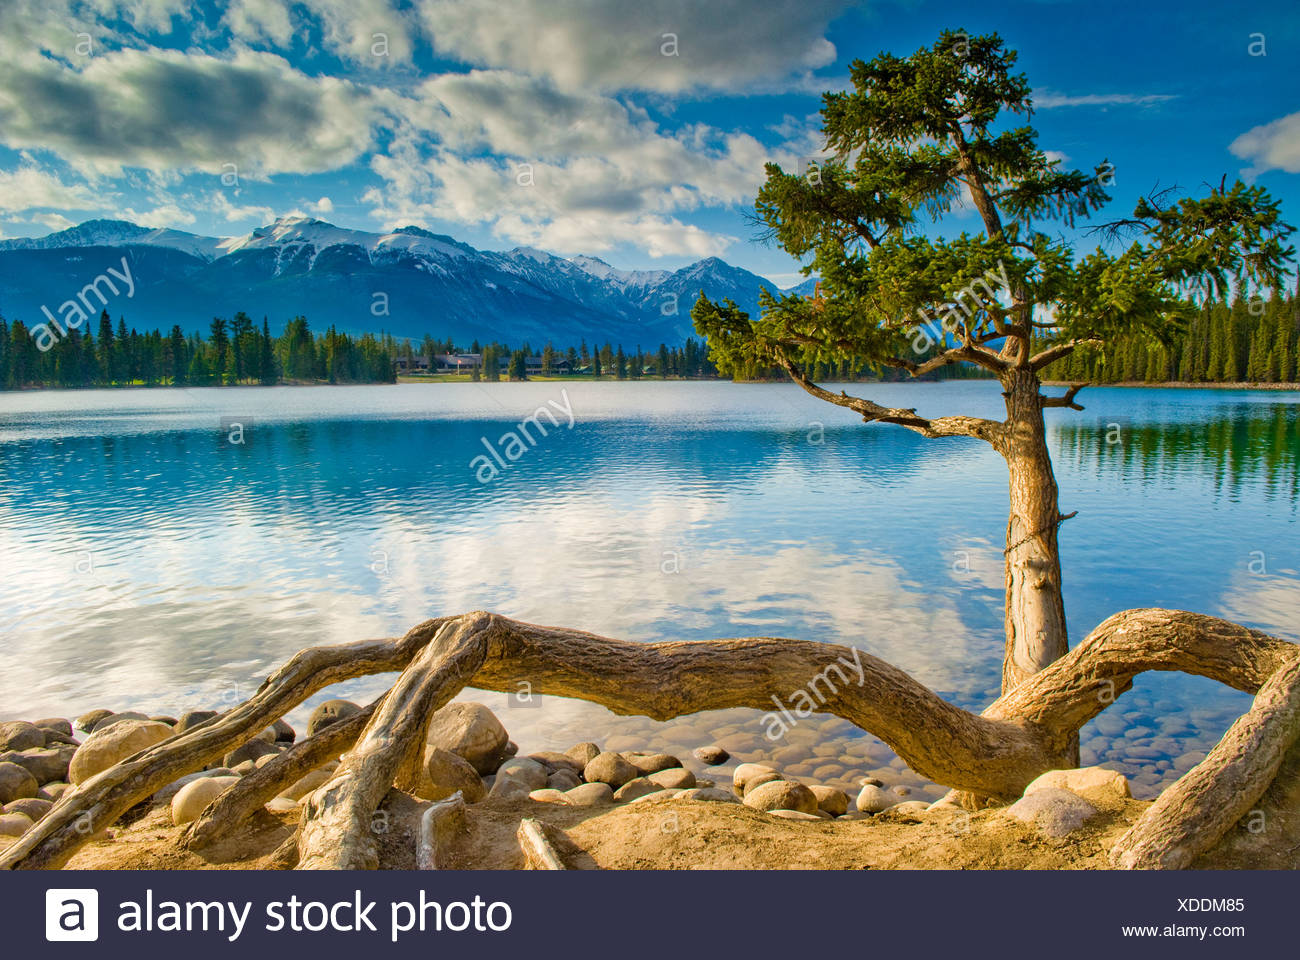 Ragged tree overlooks beautiful Lac Beauvert and The Fairmont Jasper Park Lodge, near Jasper, Alberta, Canada. - Stock Image